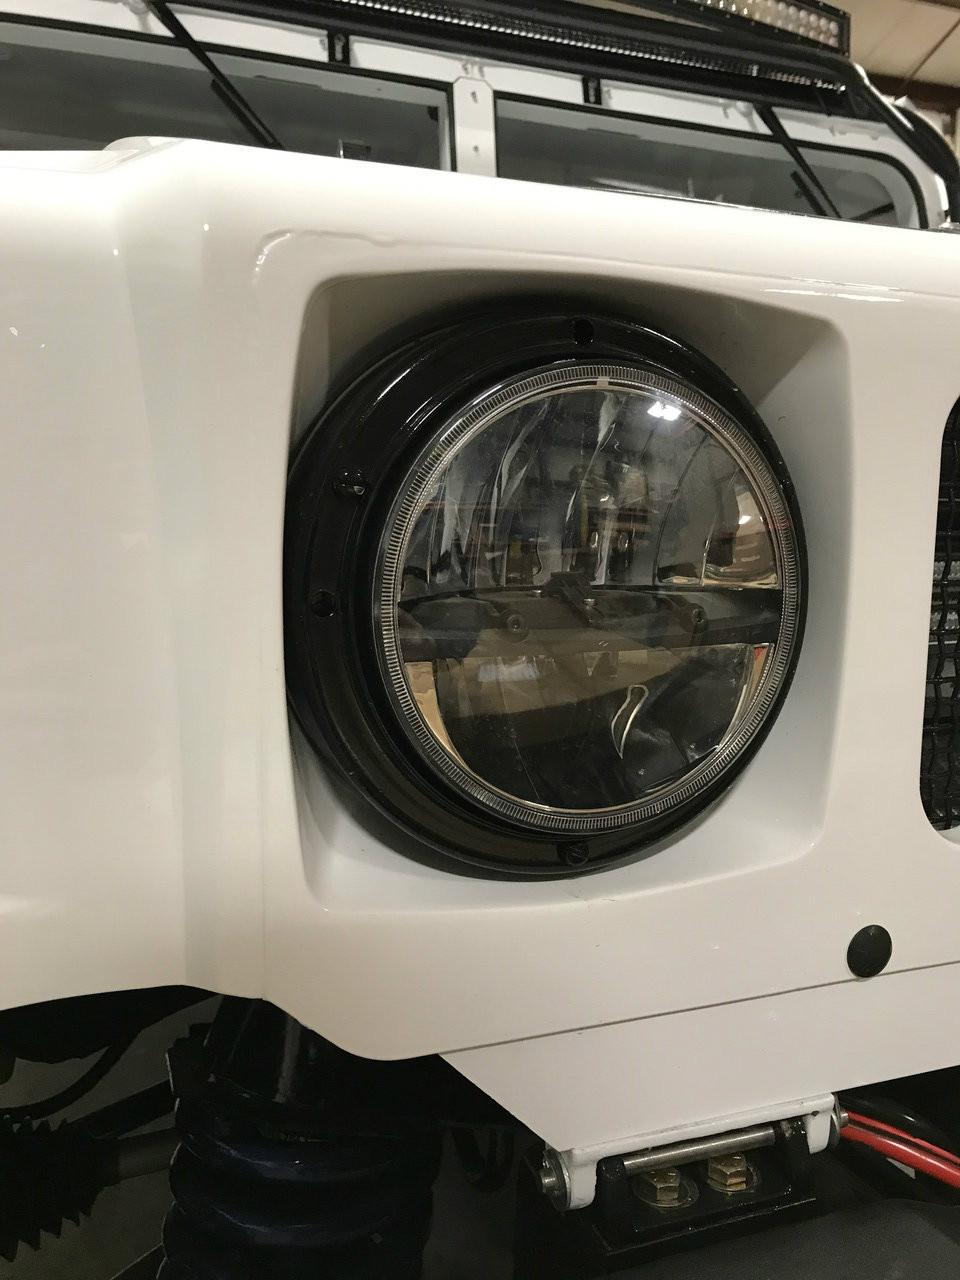 Wiring Spotlights Wiring Spotlights To High Beam Hilux Wiring Imgs